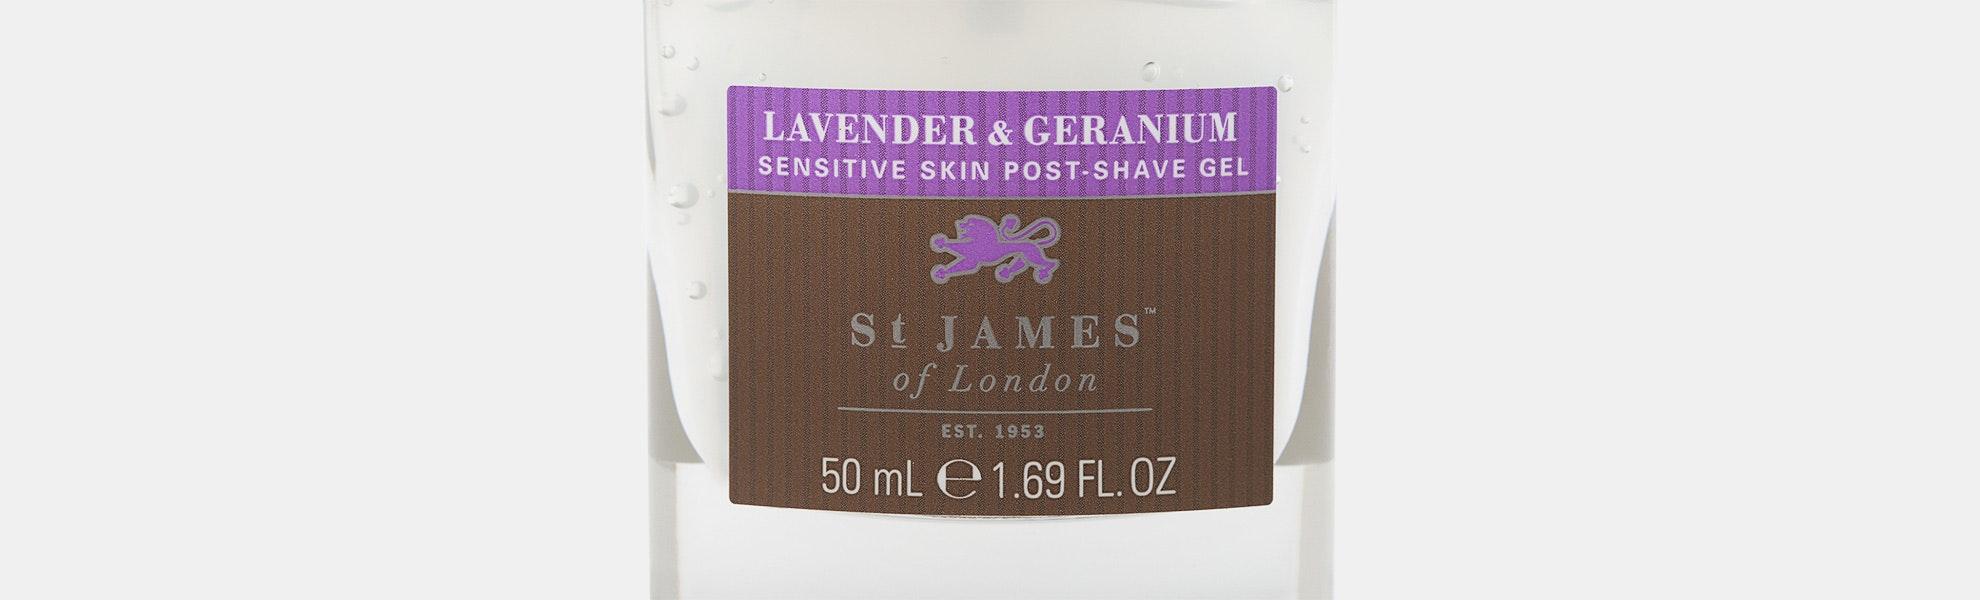 St. James of London Post-Shave Gel